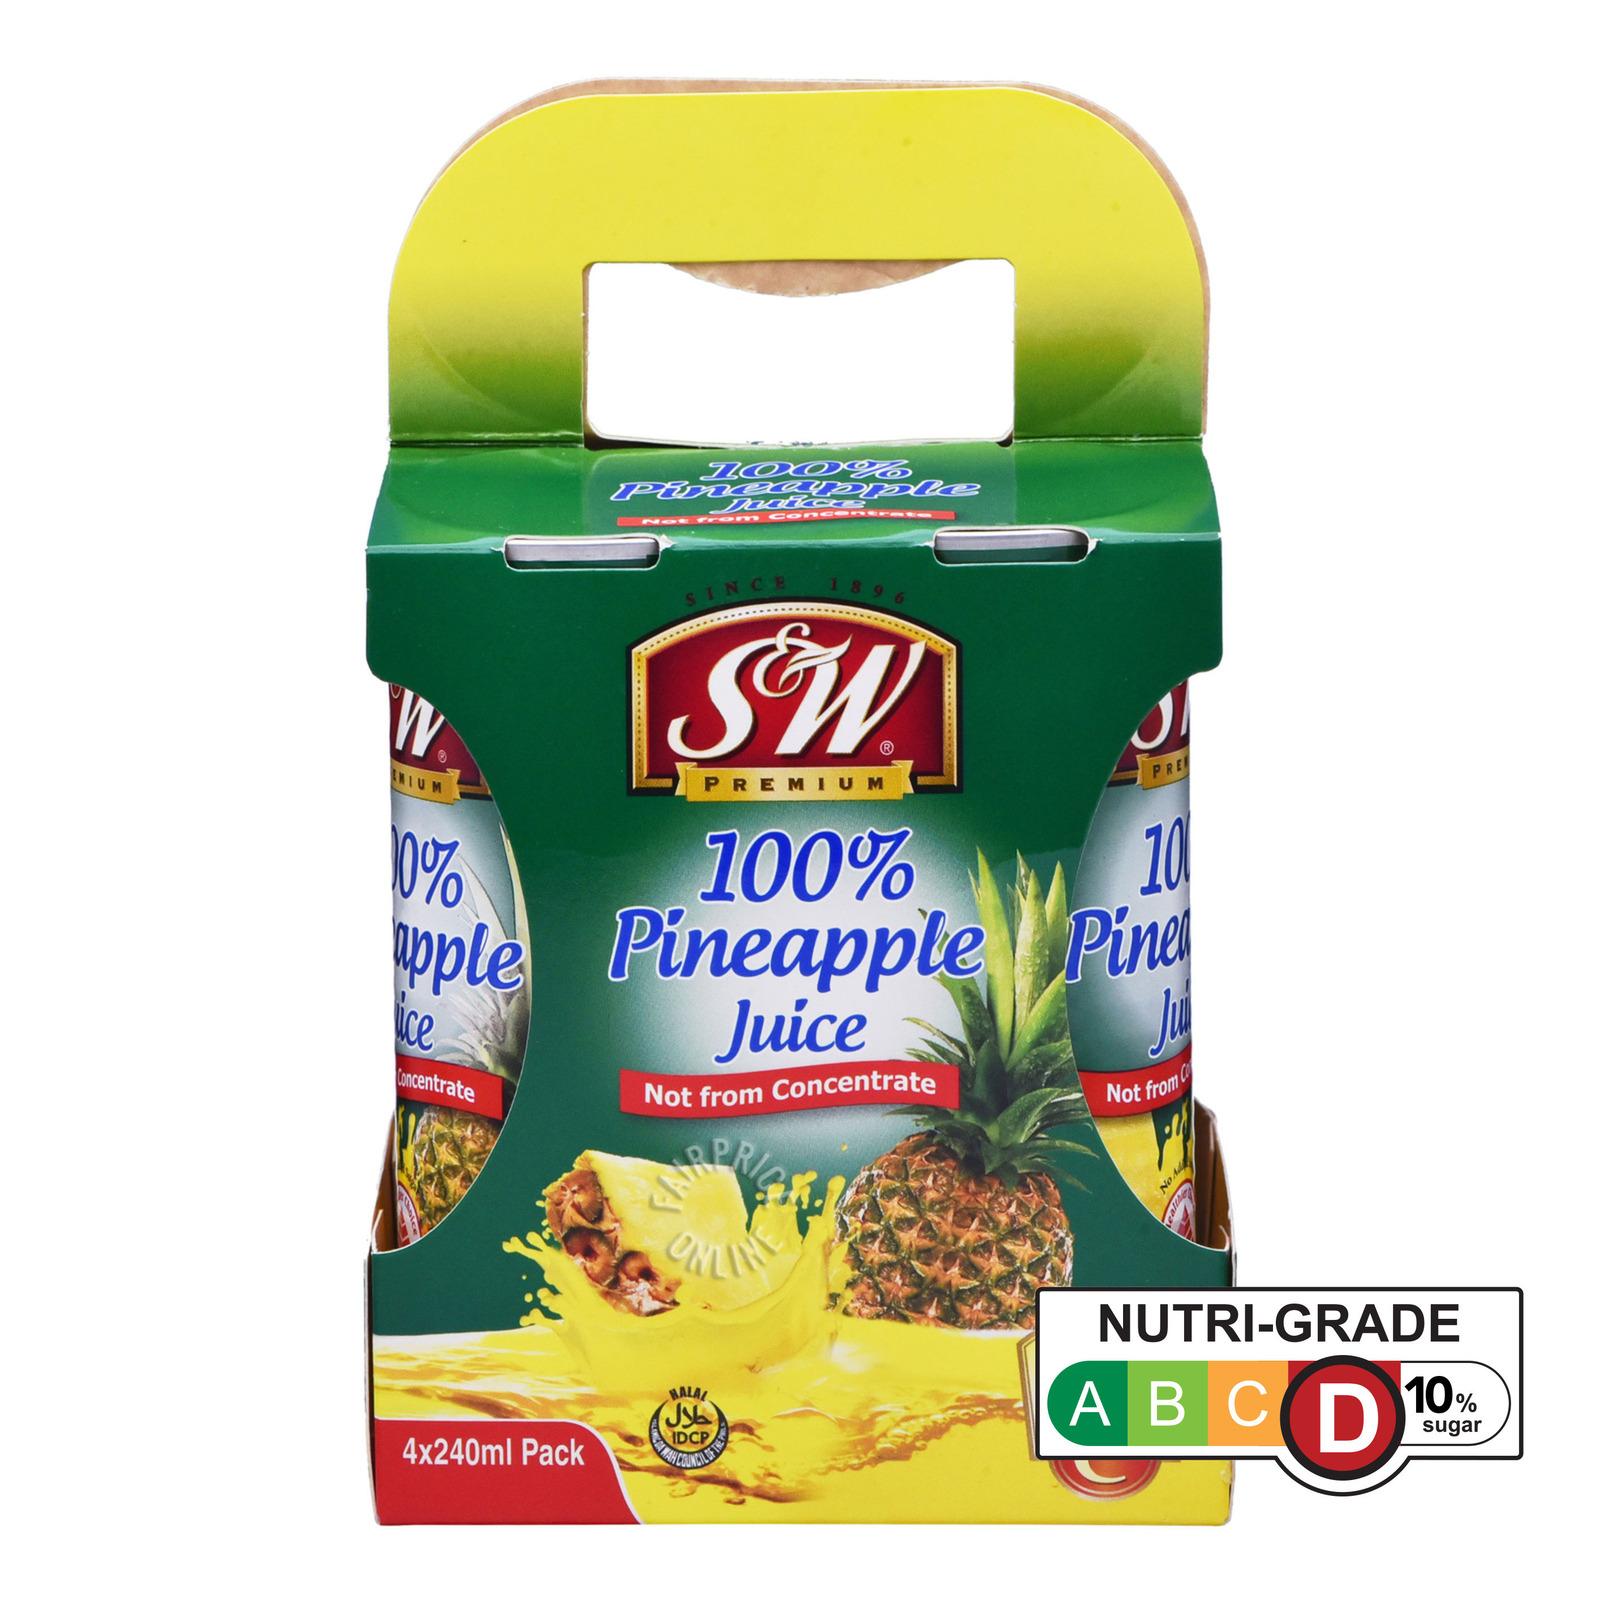 S&W Fruit Can Drink - 100% Pineapple Juice